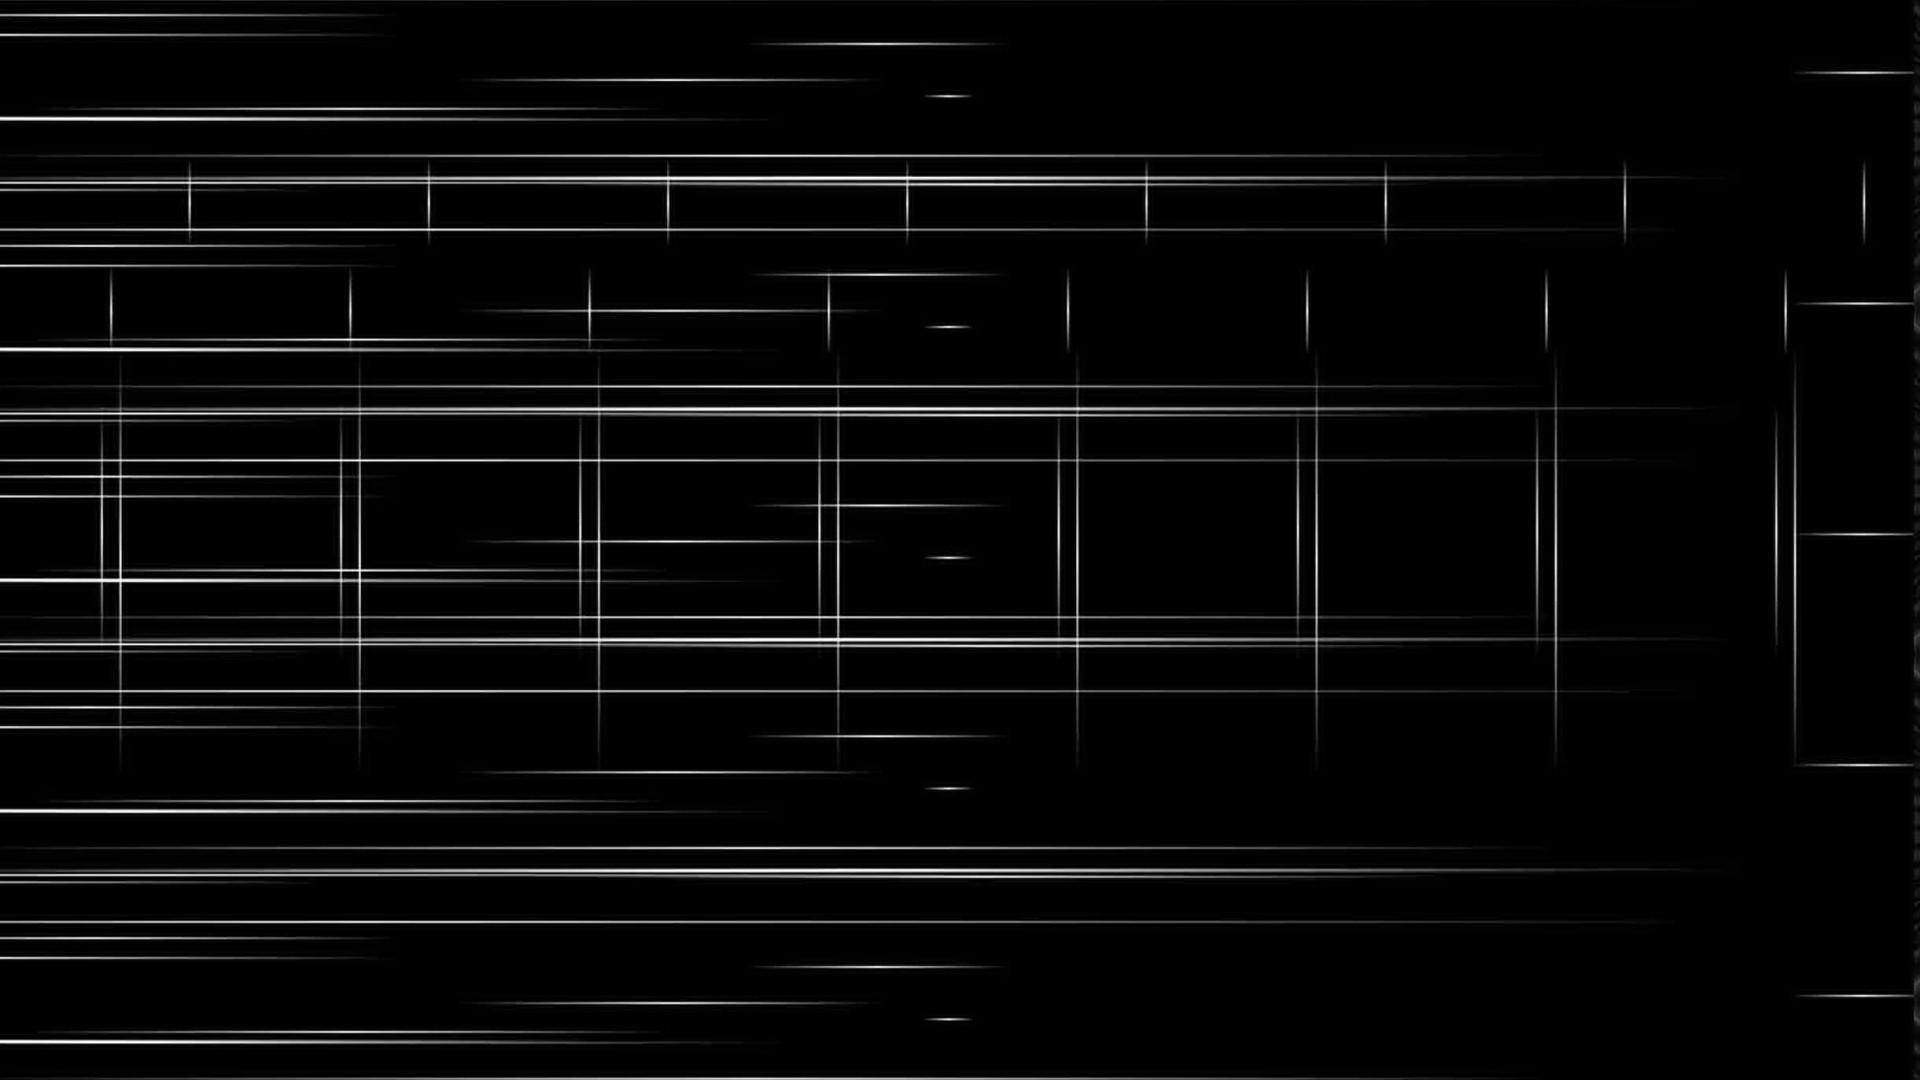 Wallpaper black background, stripes, black and white, minimalist